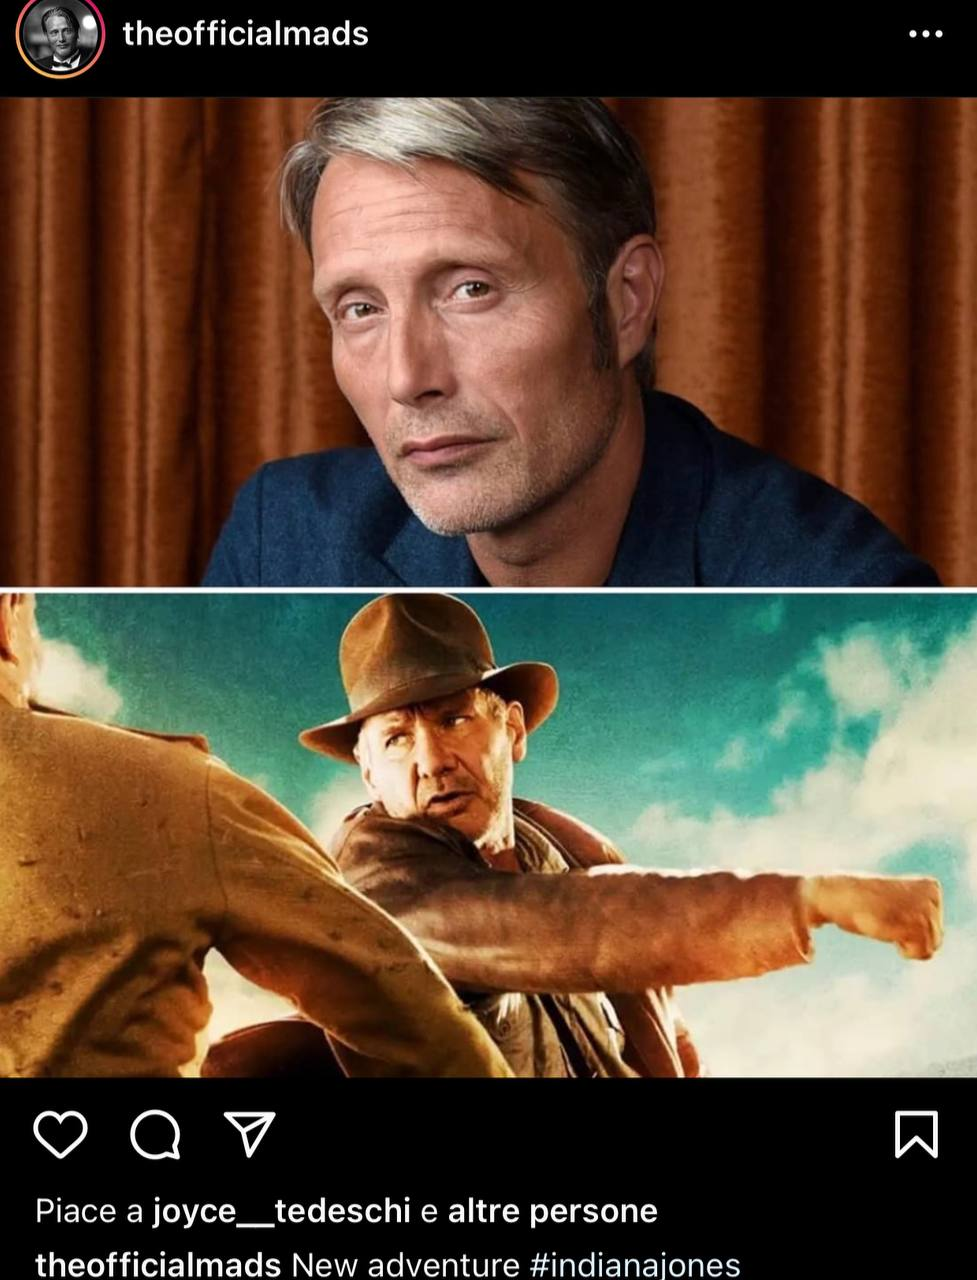 Indiana Jones Mad Mikkelsen